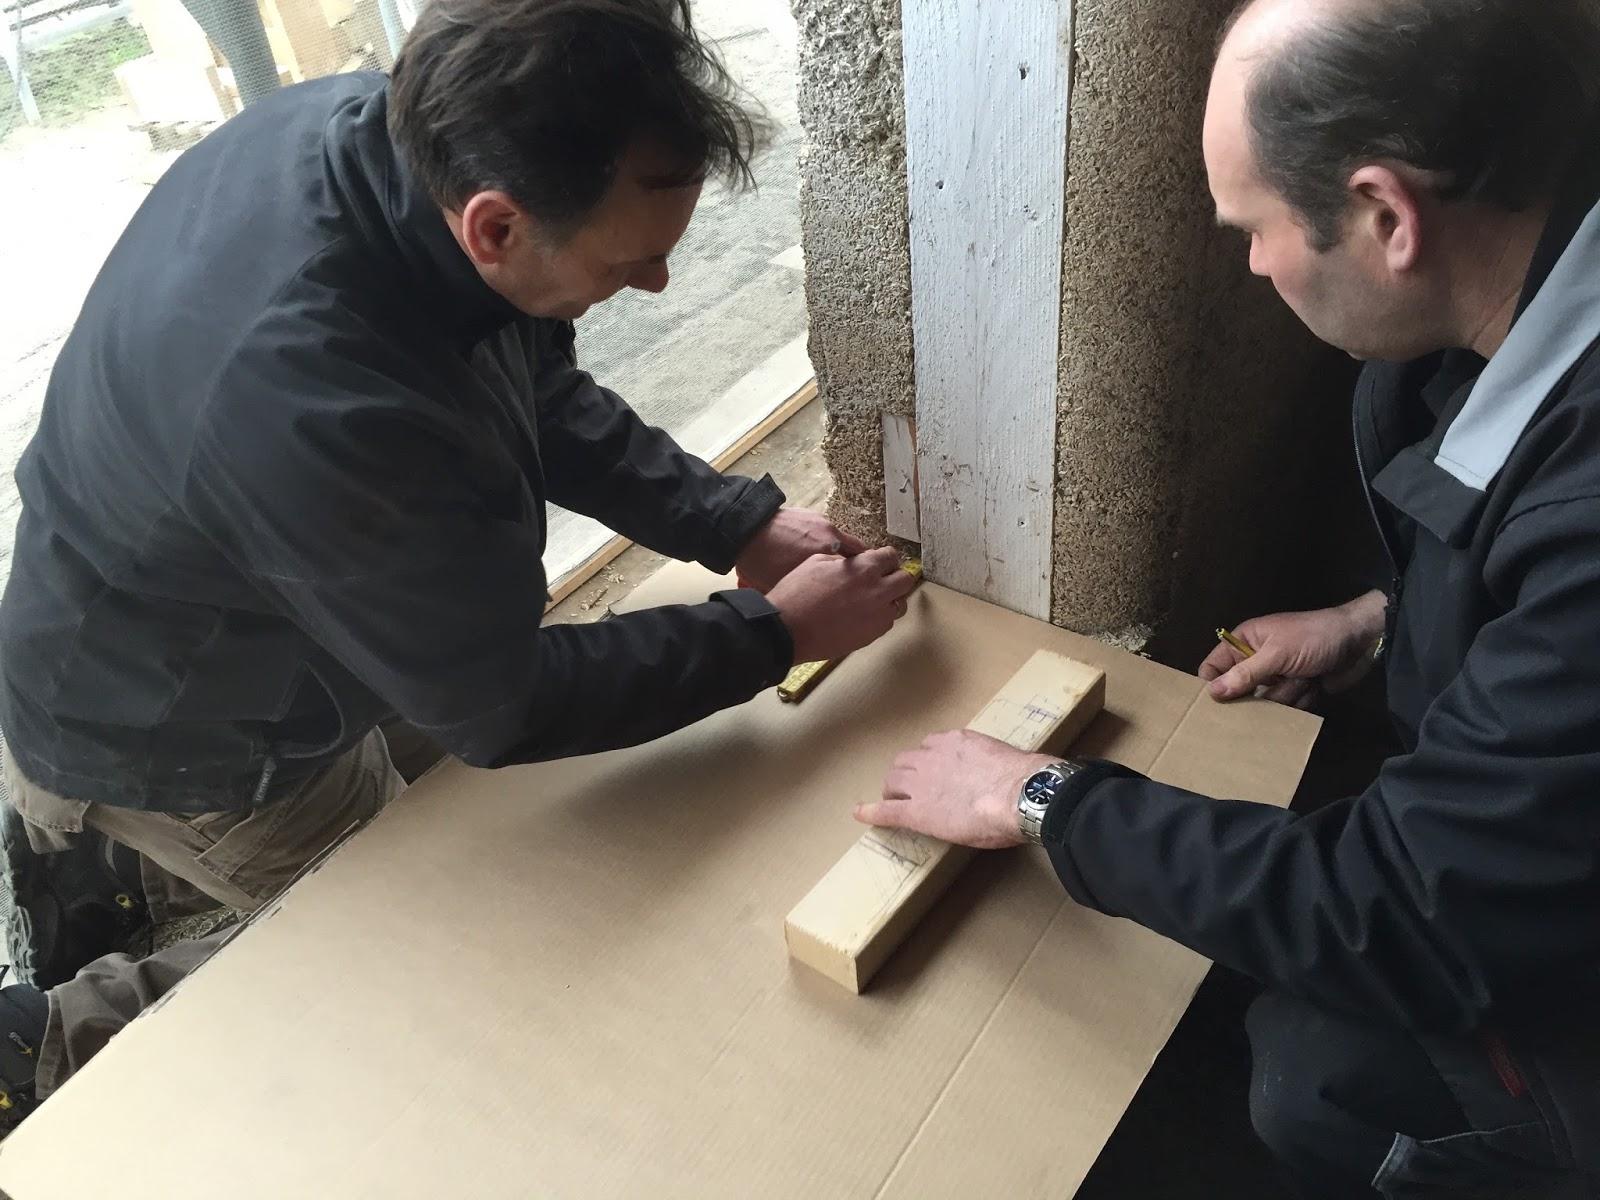 Grijze massa: hennephuis 2.0: klant gericht bouwen